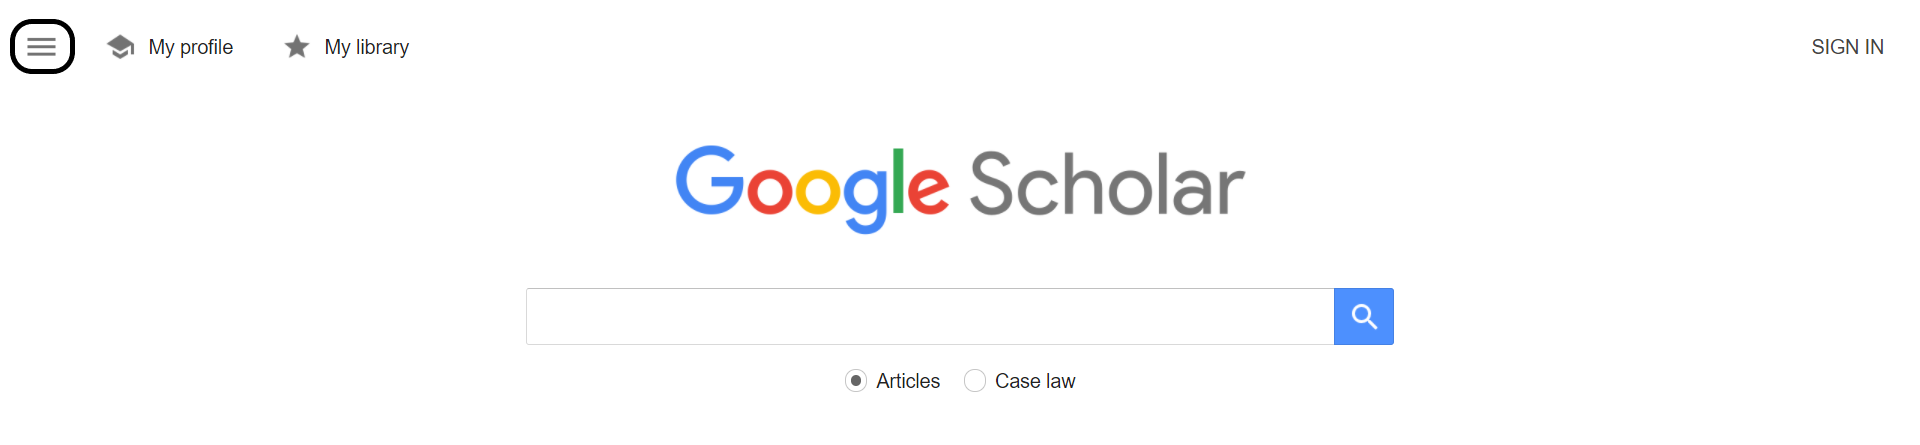 Google Scholar homepage with hamburger menu highlighted